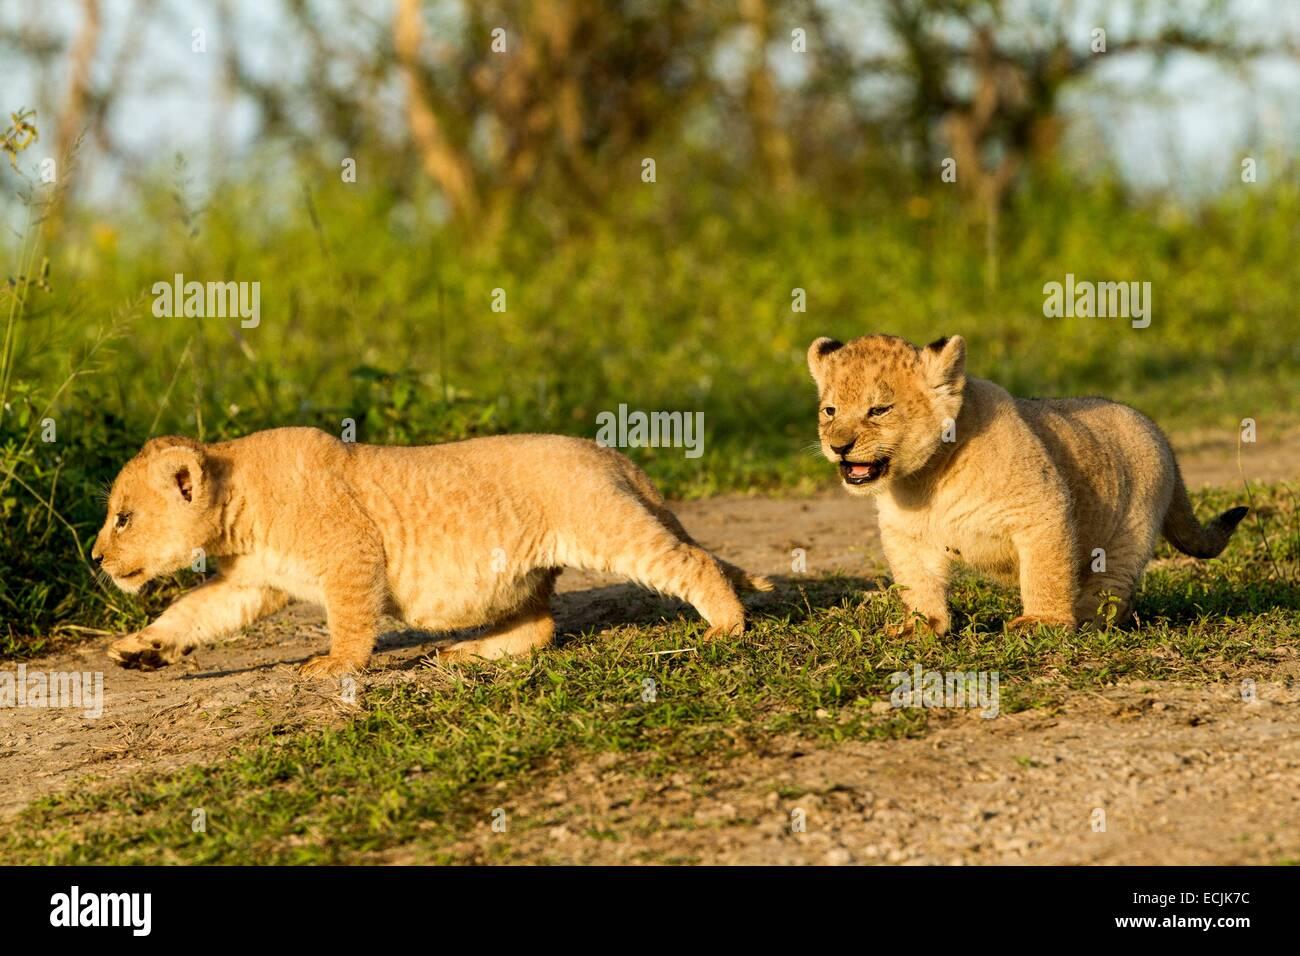 Tanzanie, Ngorongoro national park, lion (Panthera leo), babies - Stock Image